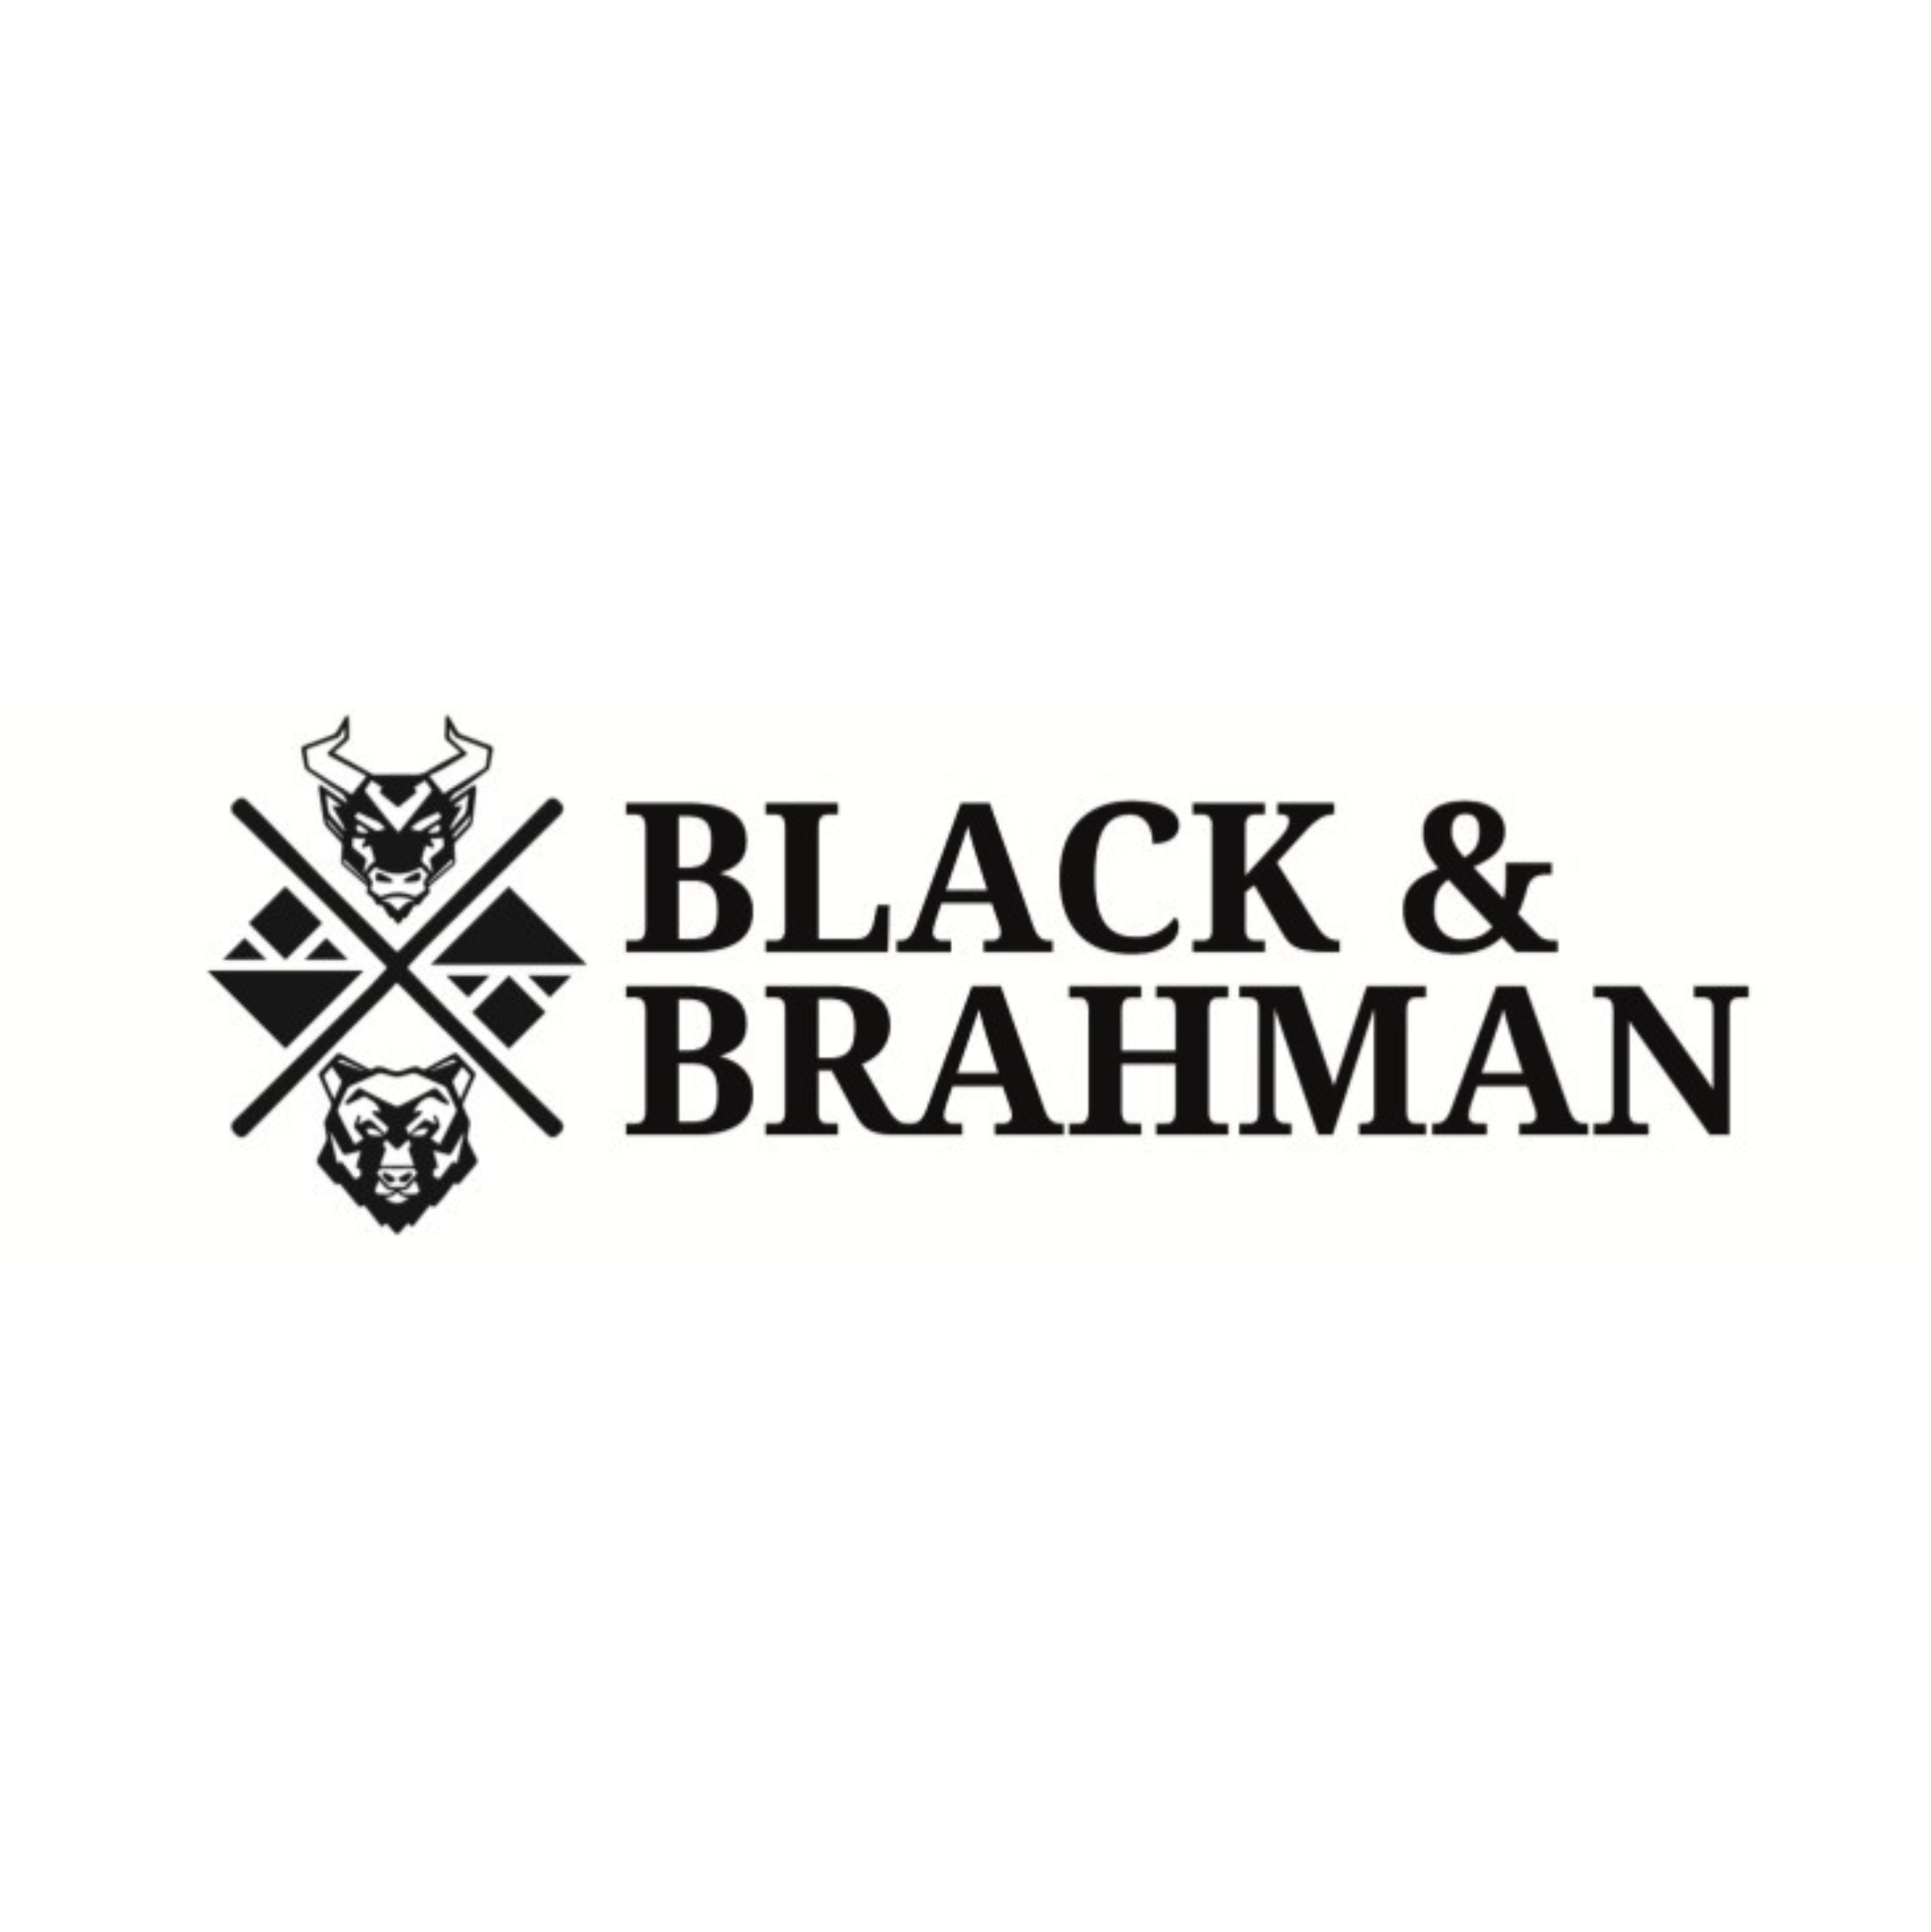 Black & Brahman-01